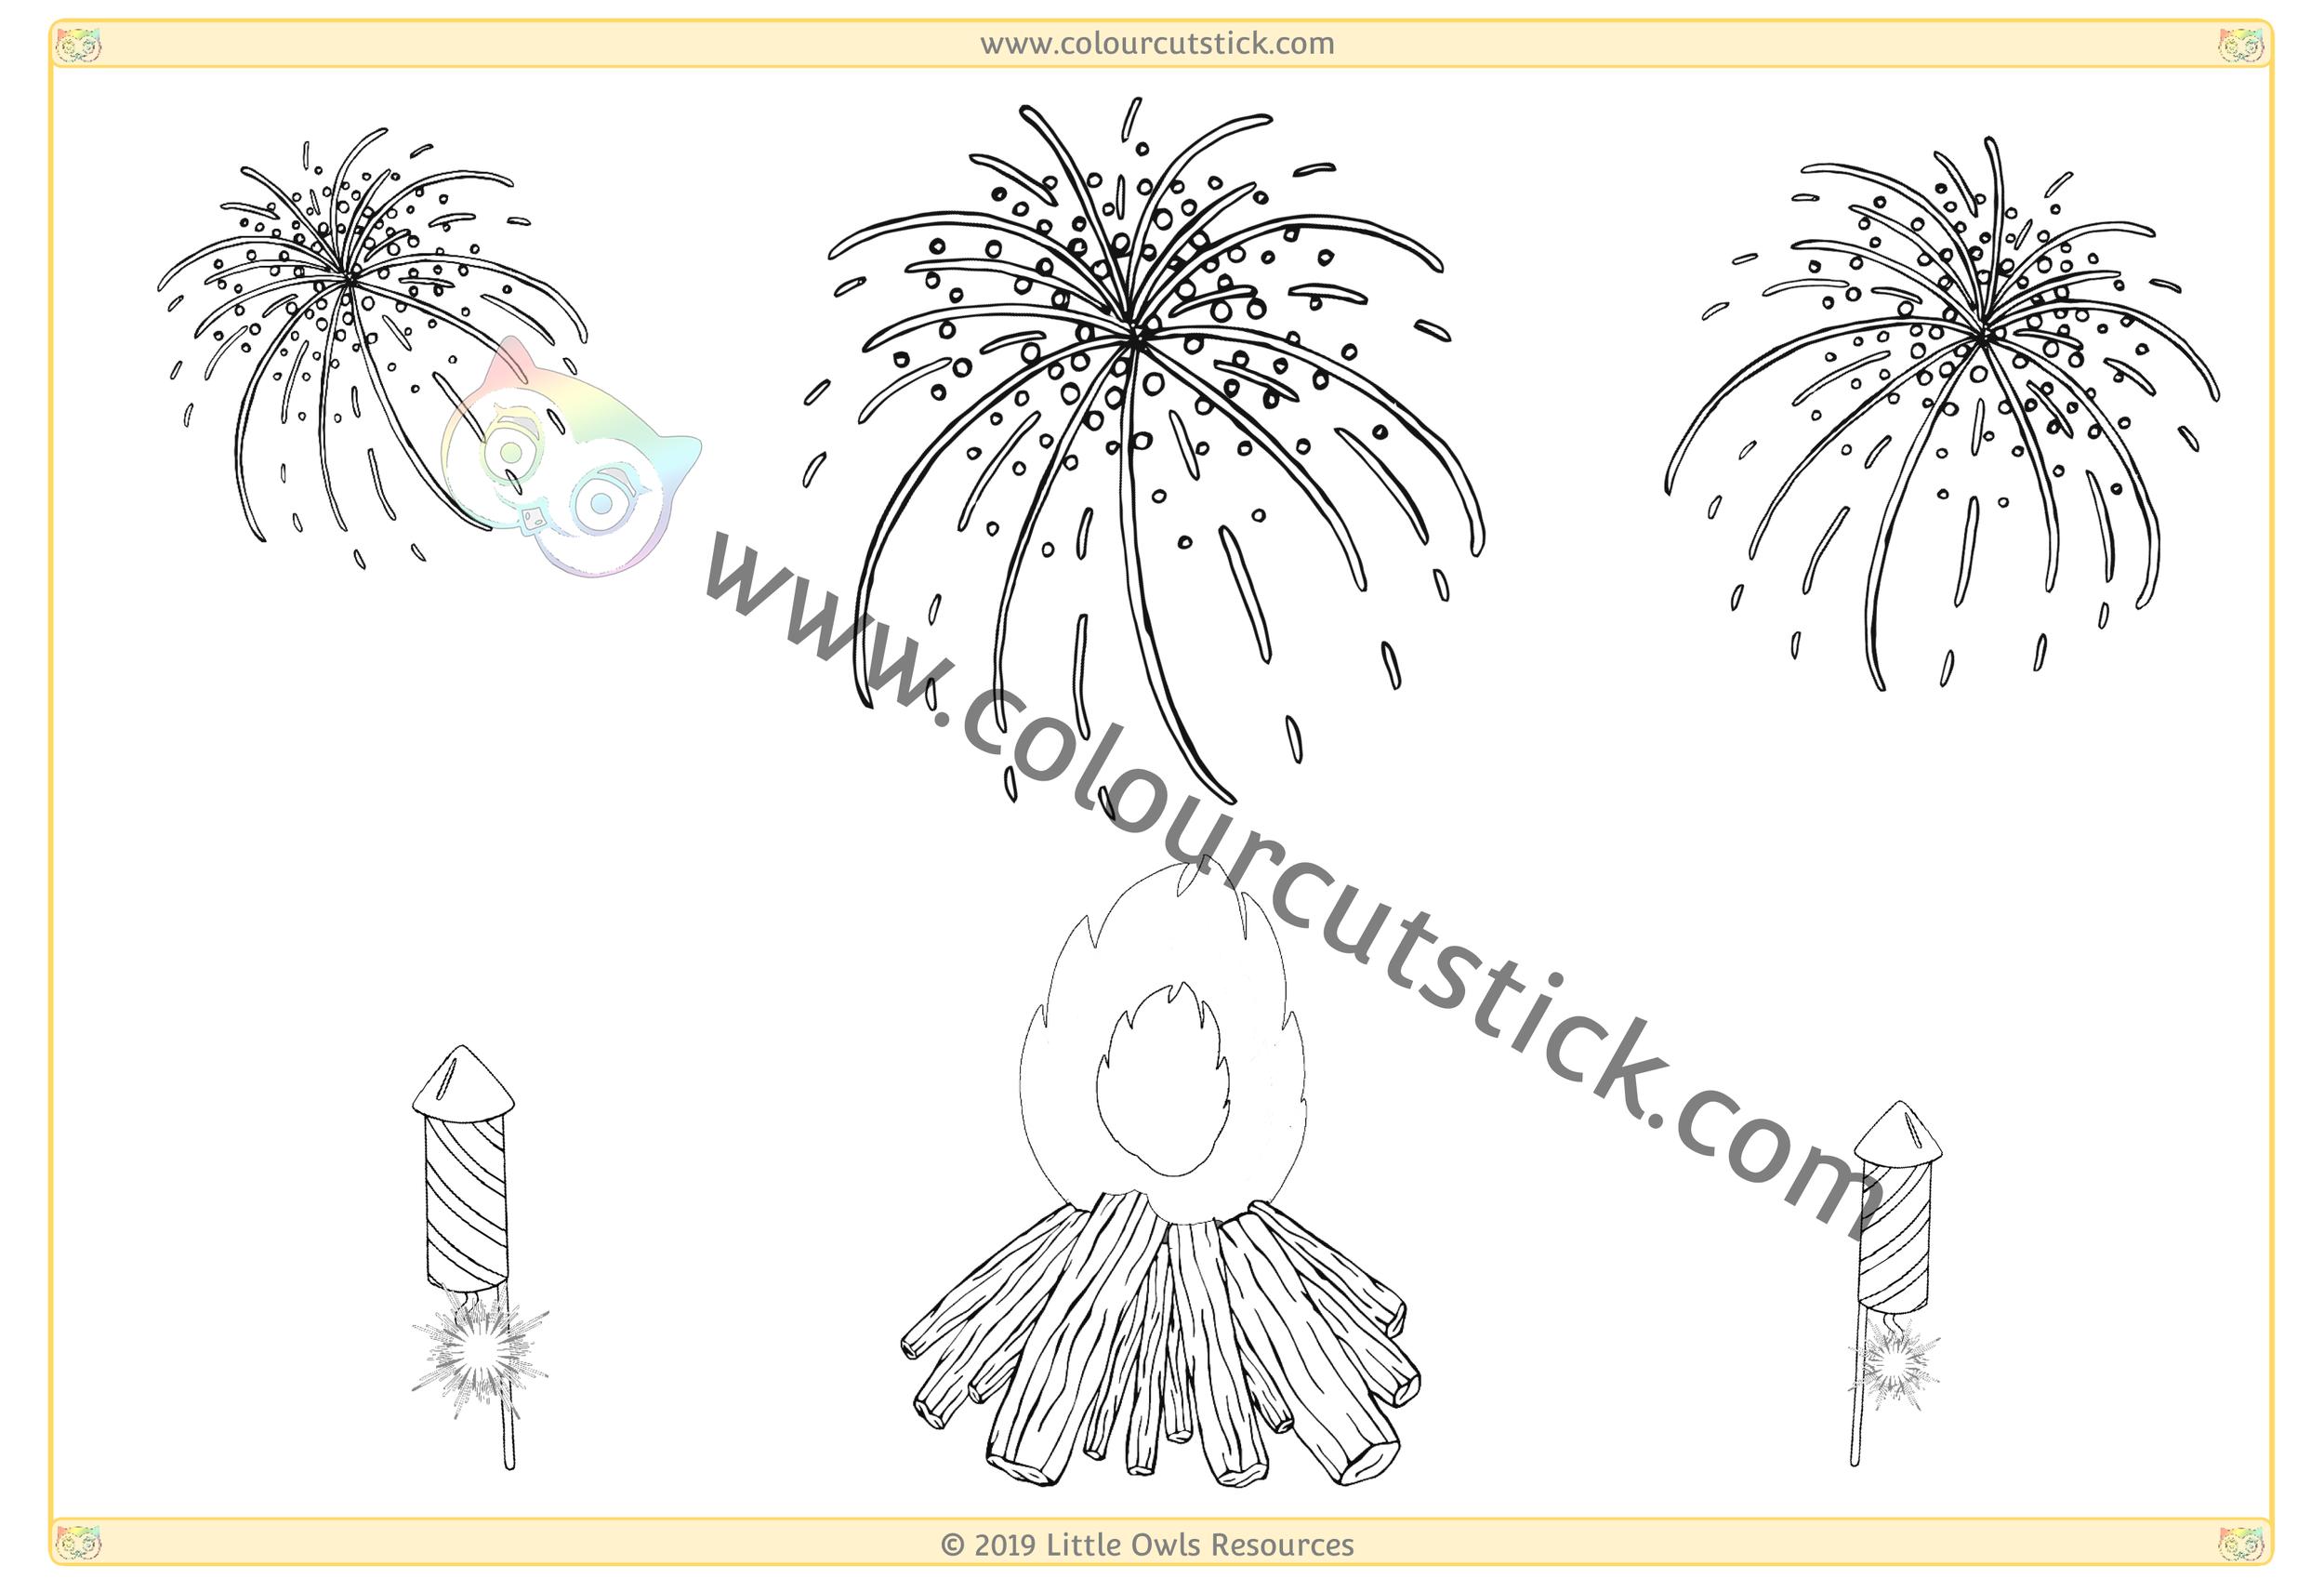 Fireworks & Bonfire -